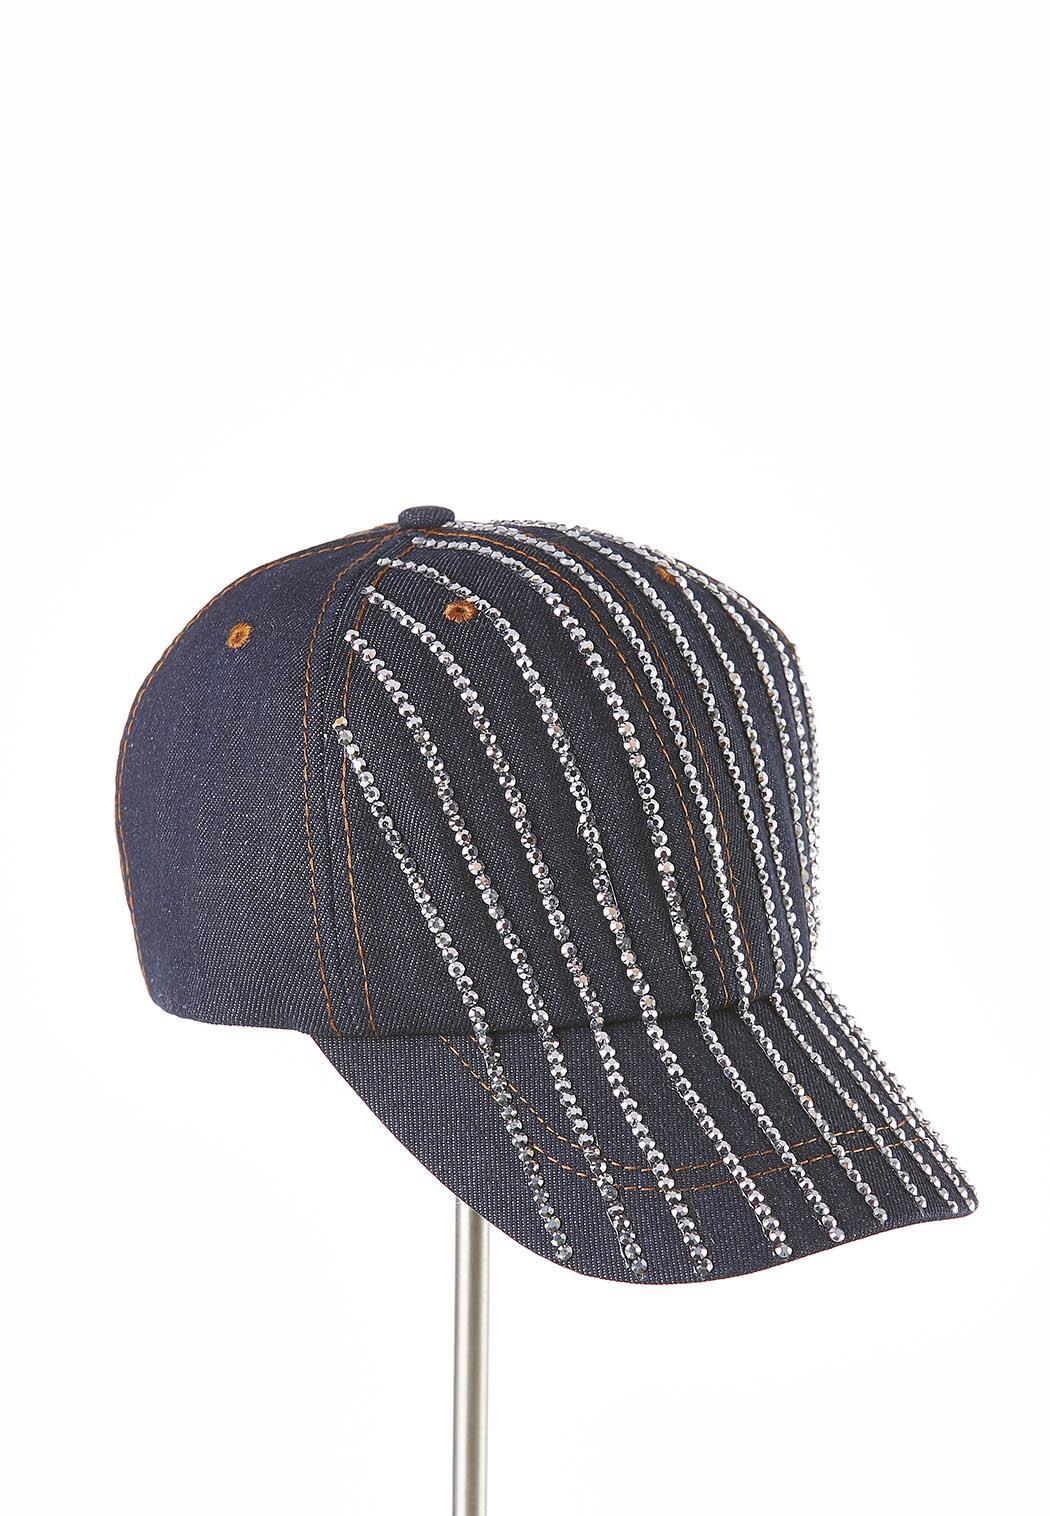 832d6b8b7b481 Rhinestone Denim Hat Hats   Hair Cato Fashions